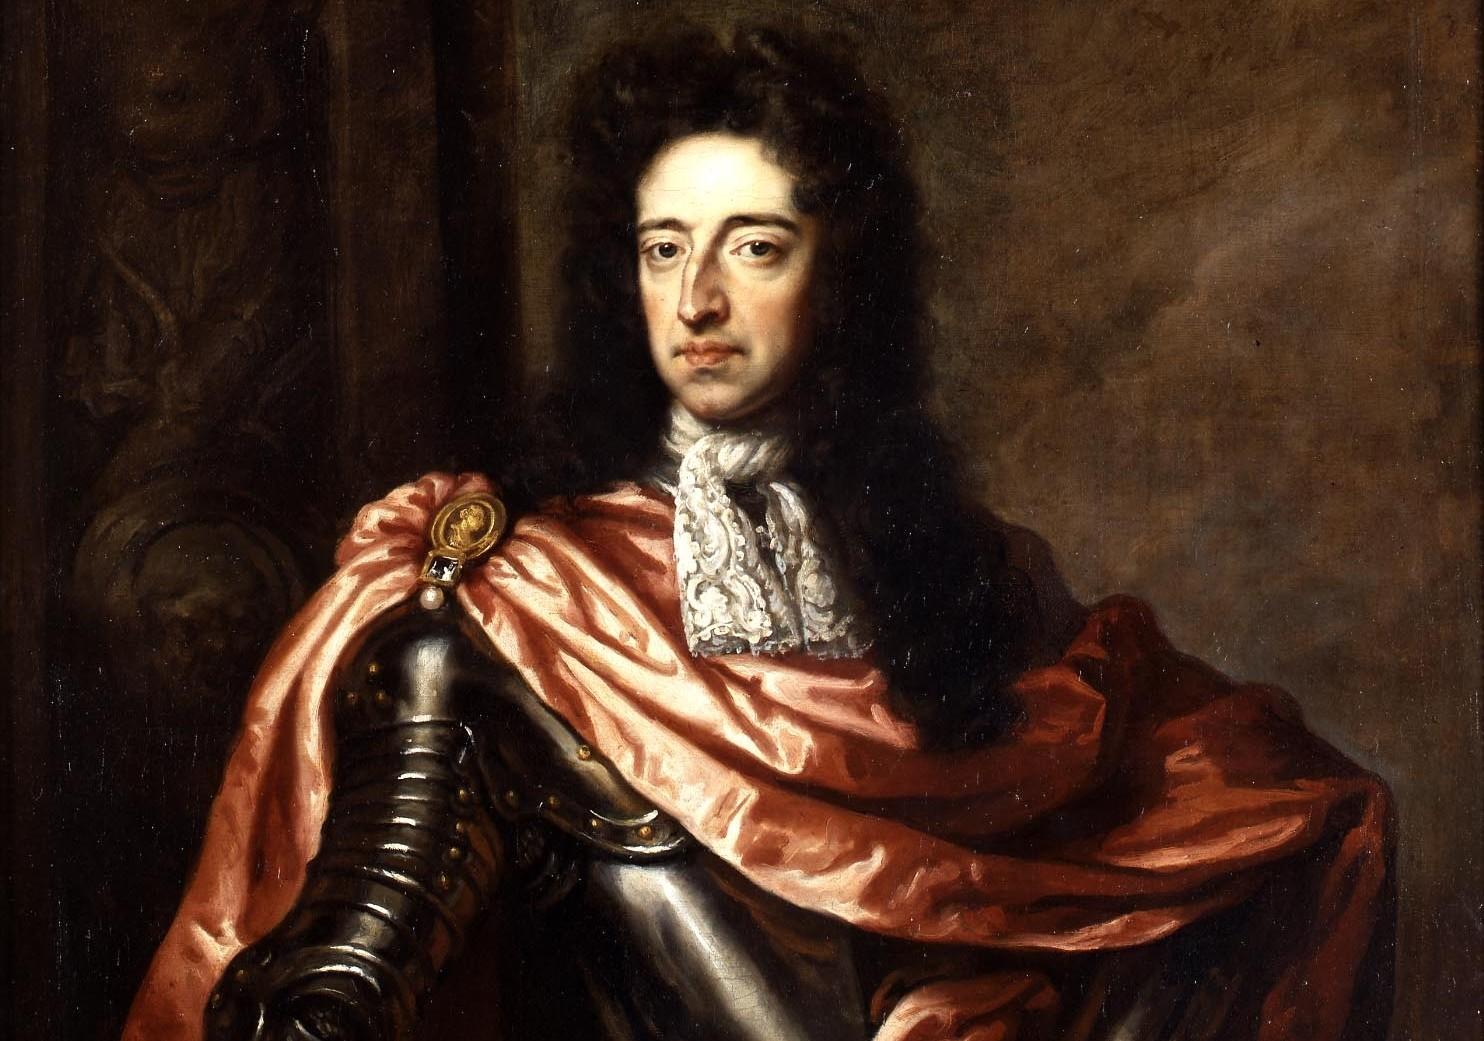 Koning-stadhouder Willem III van Oranje